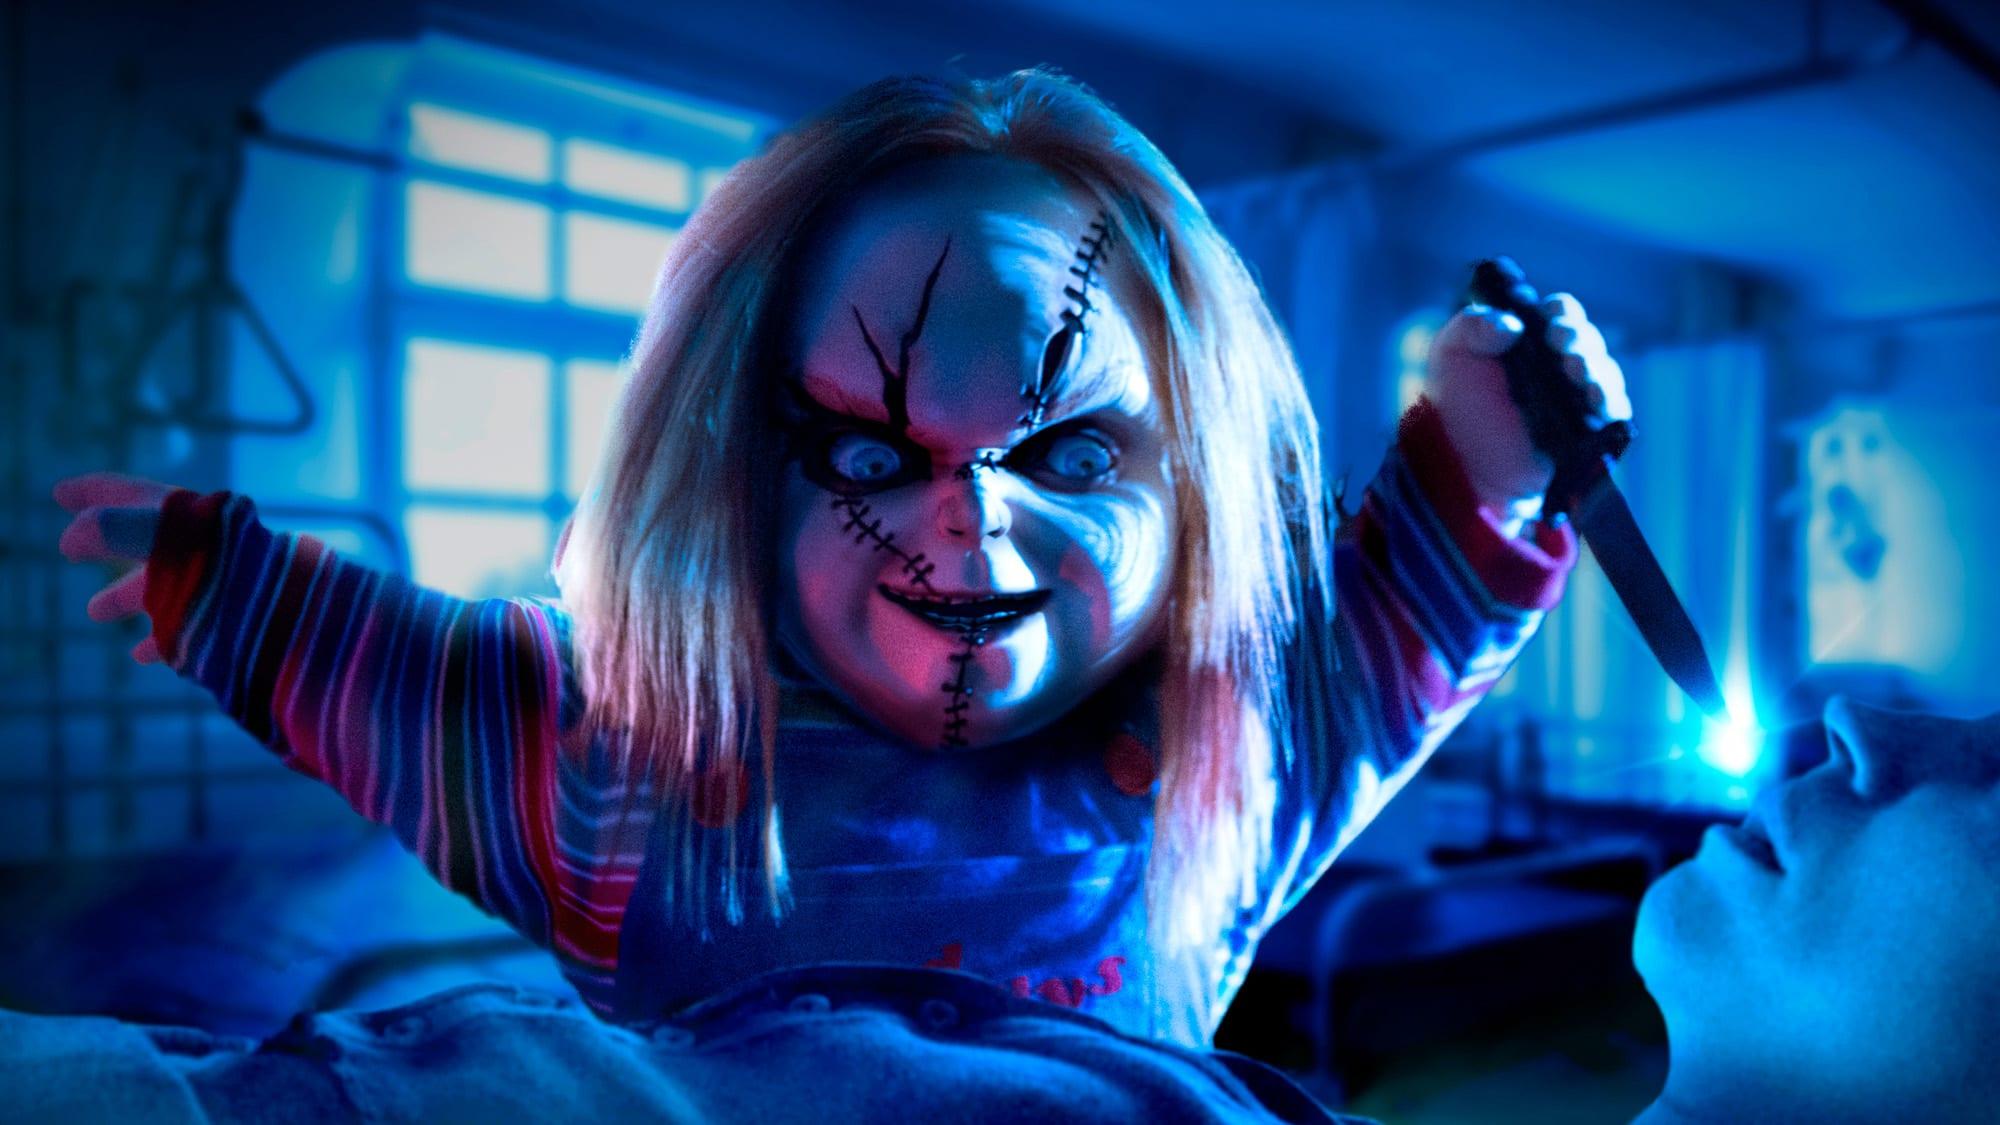 halloween tại universal studios nhật bản: chucky's hospital ward of hell